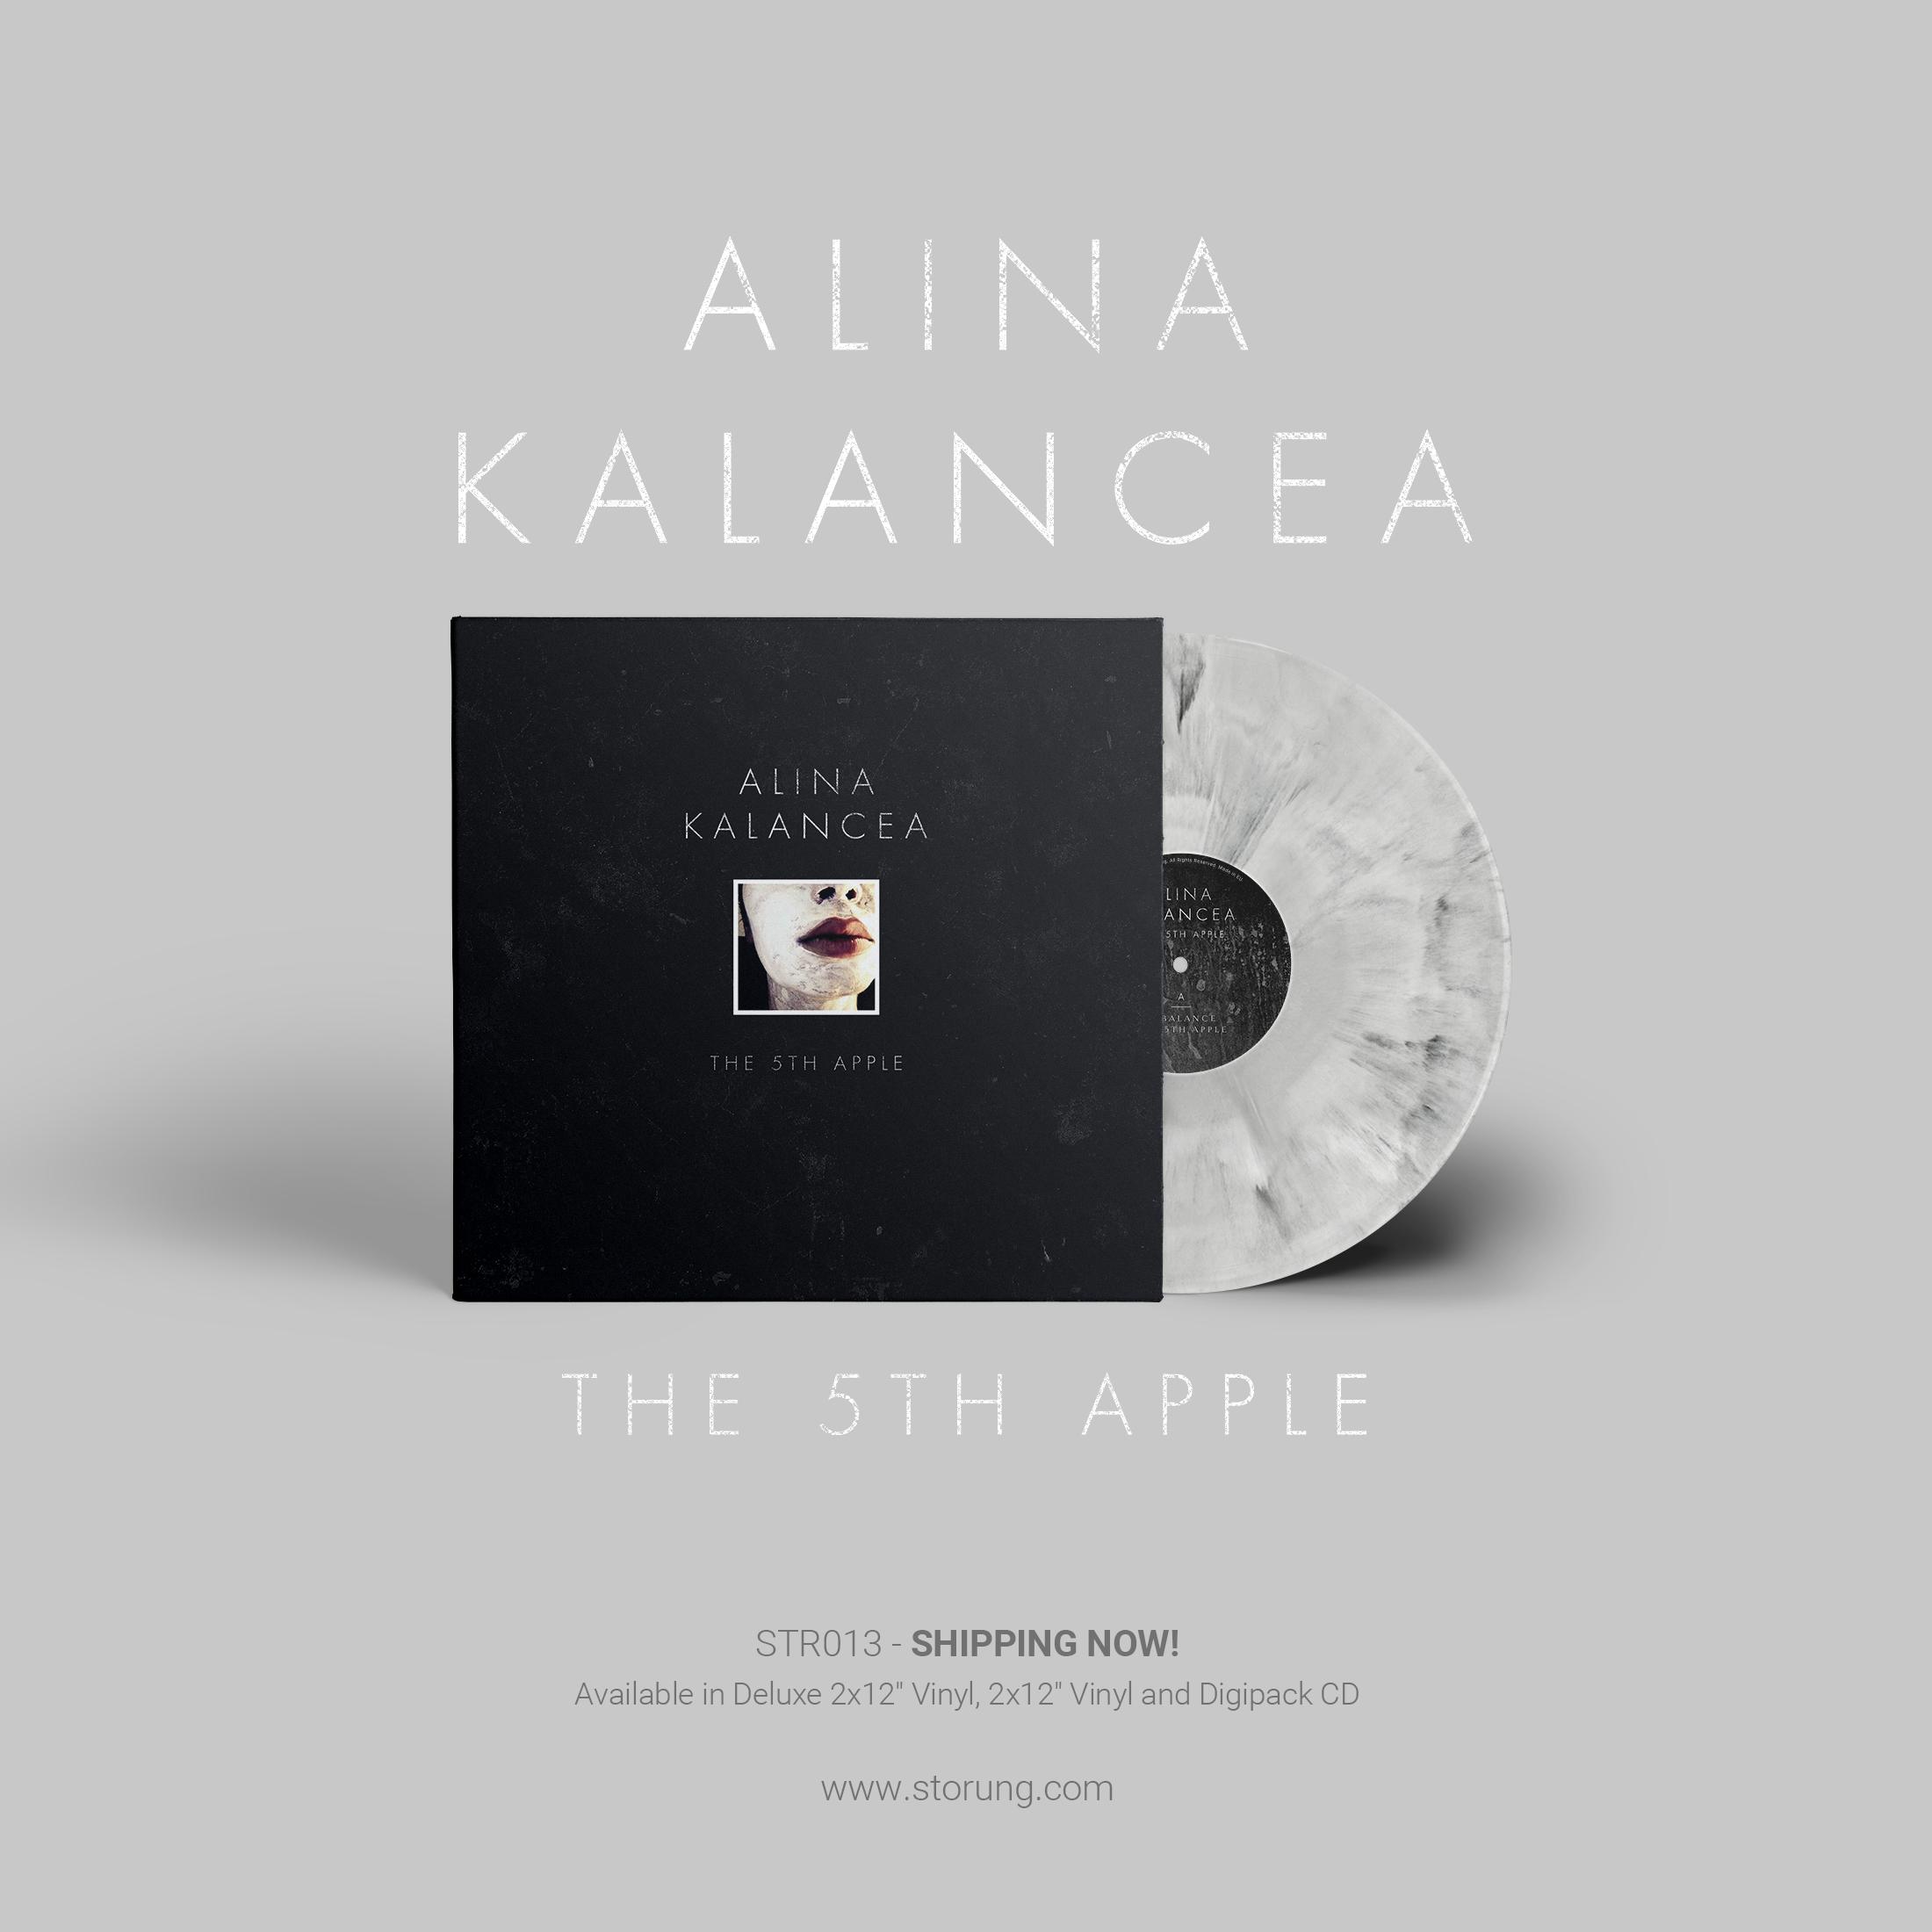 Alina Kalancea – The 5th Apple